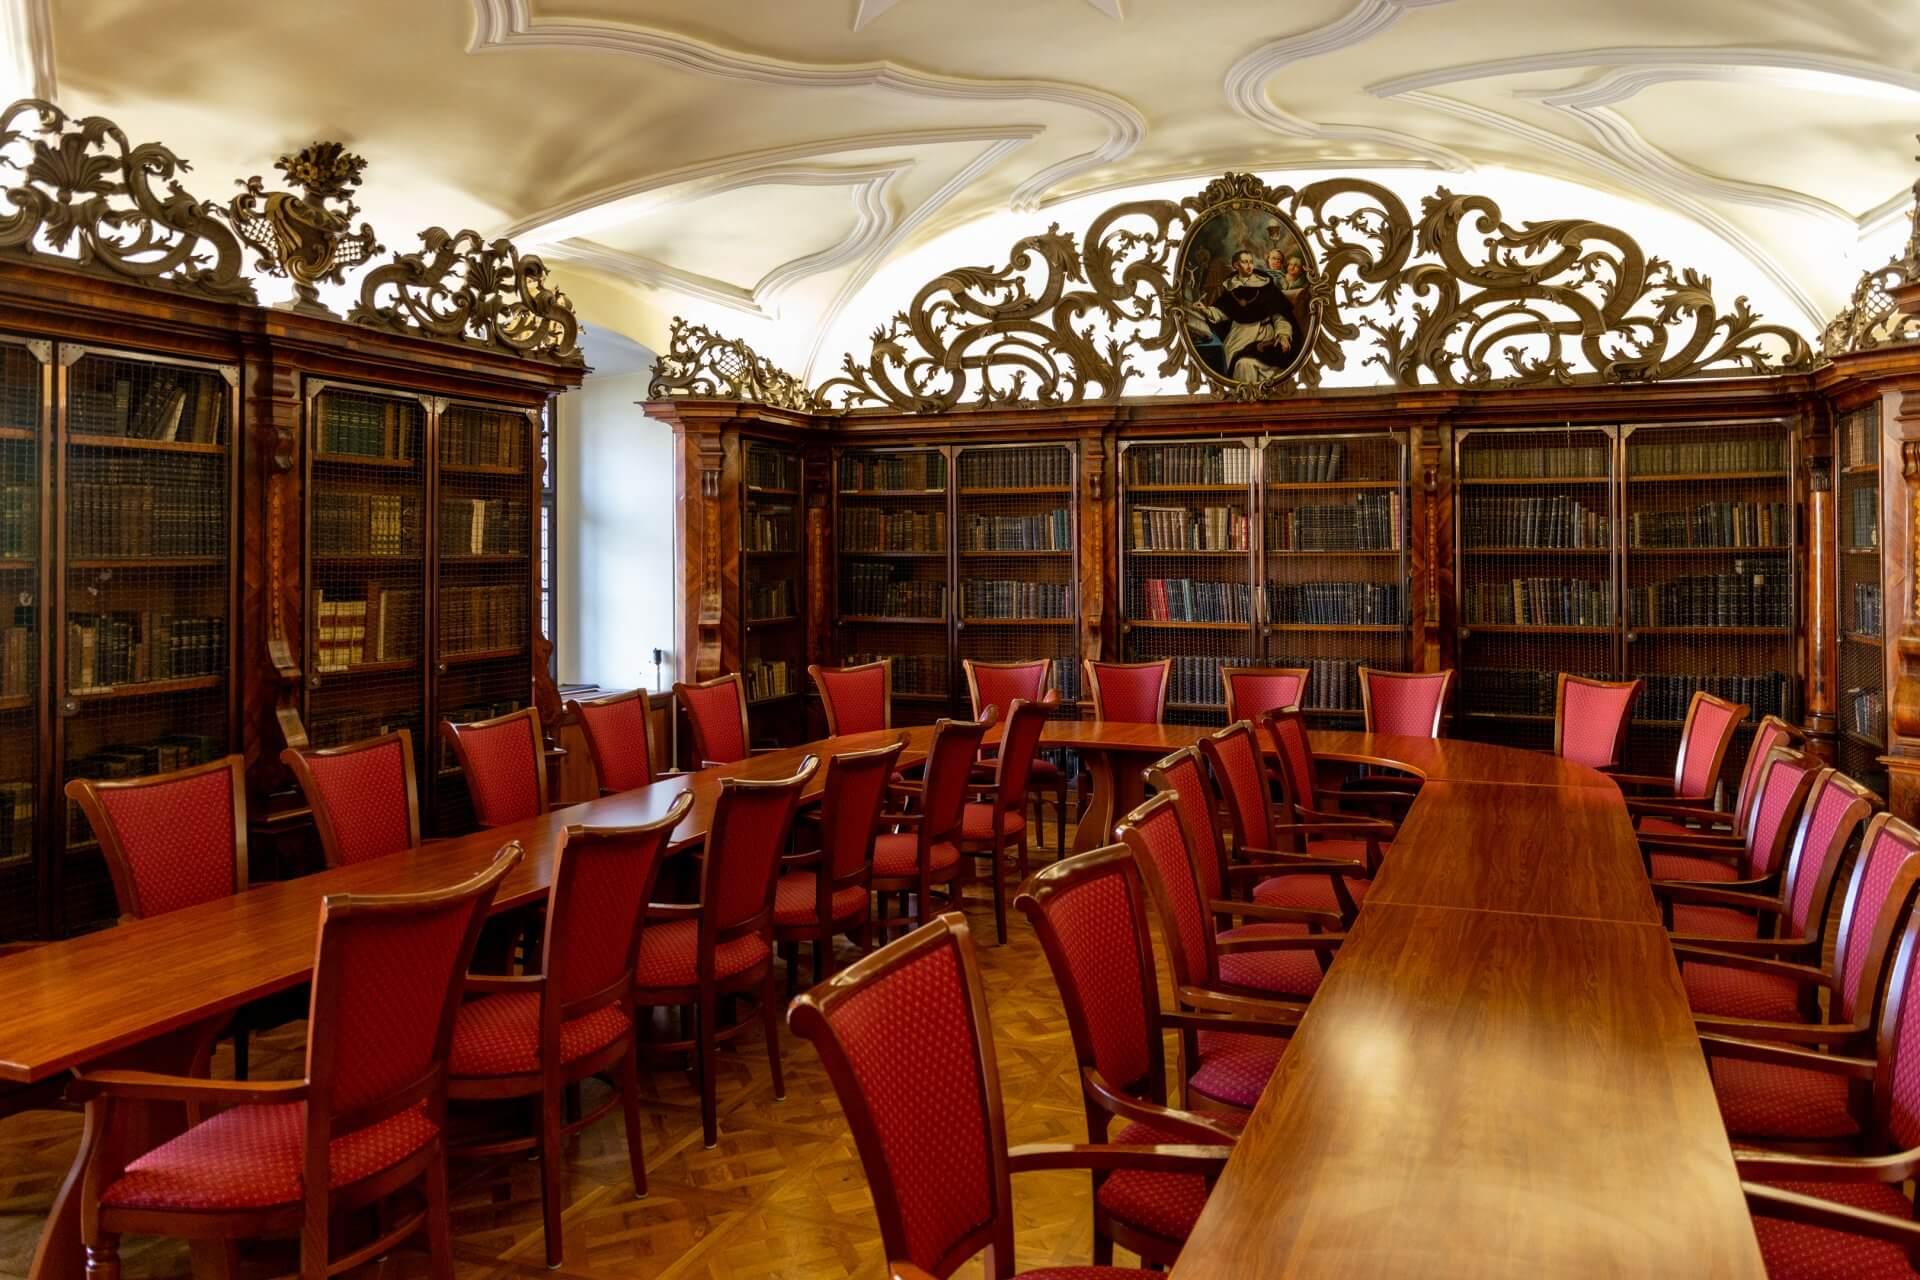 Barockzimmer (Barokk térem) im Hotel Klastrum Győr